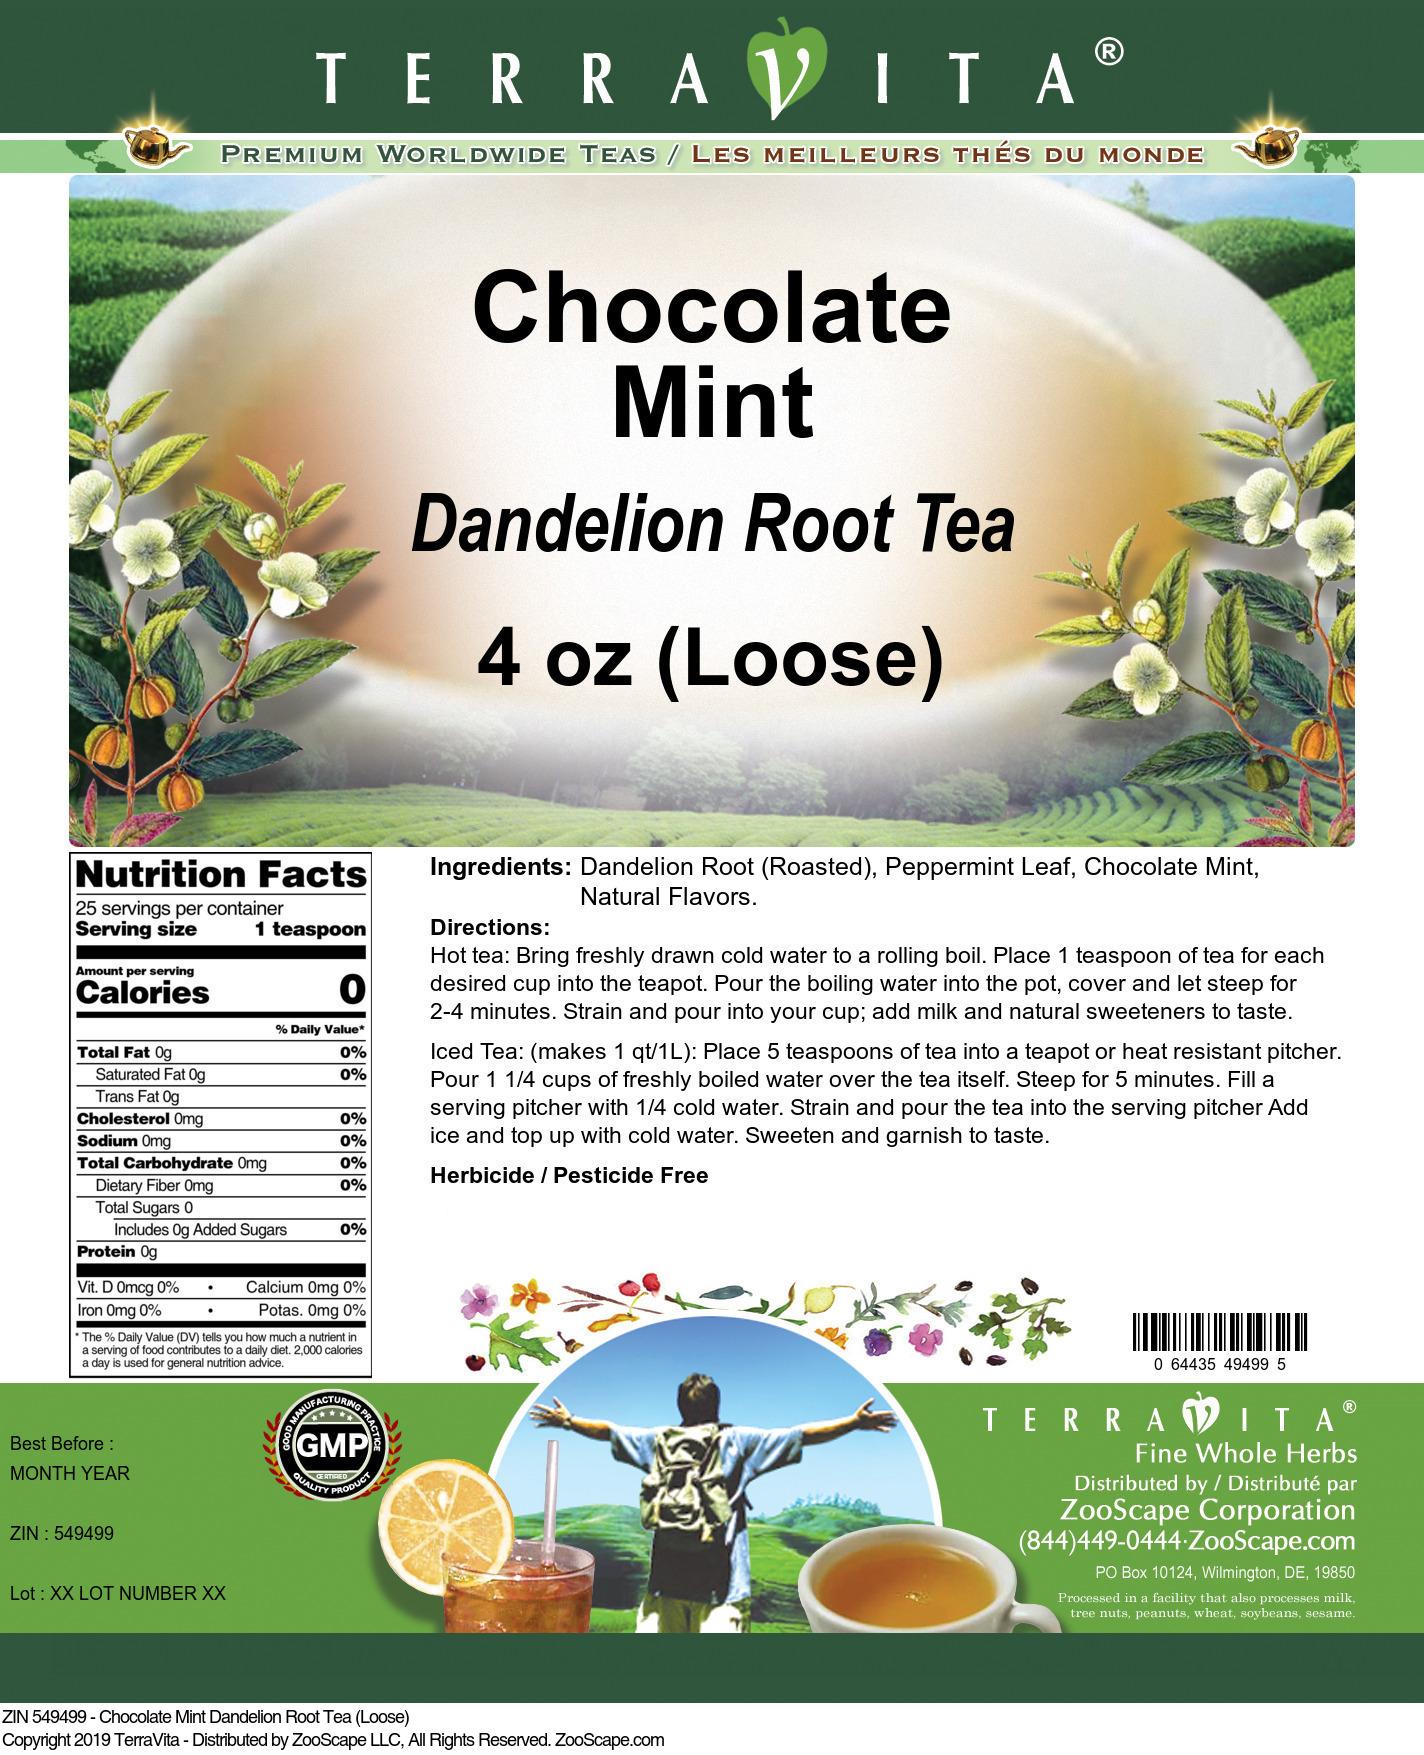 Chocolate Mint Dandelion Root Tea (Loose)